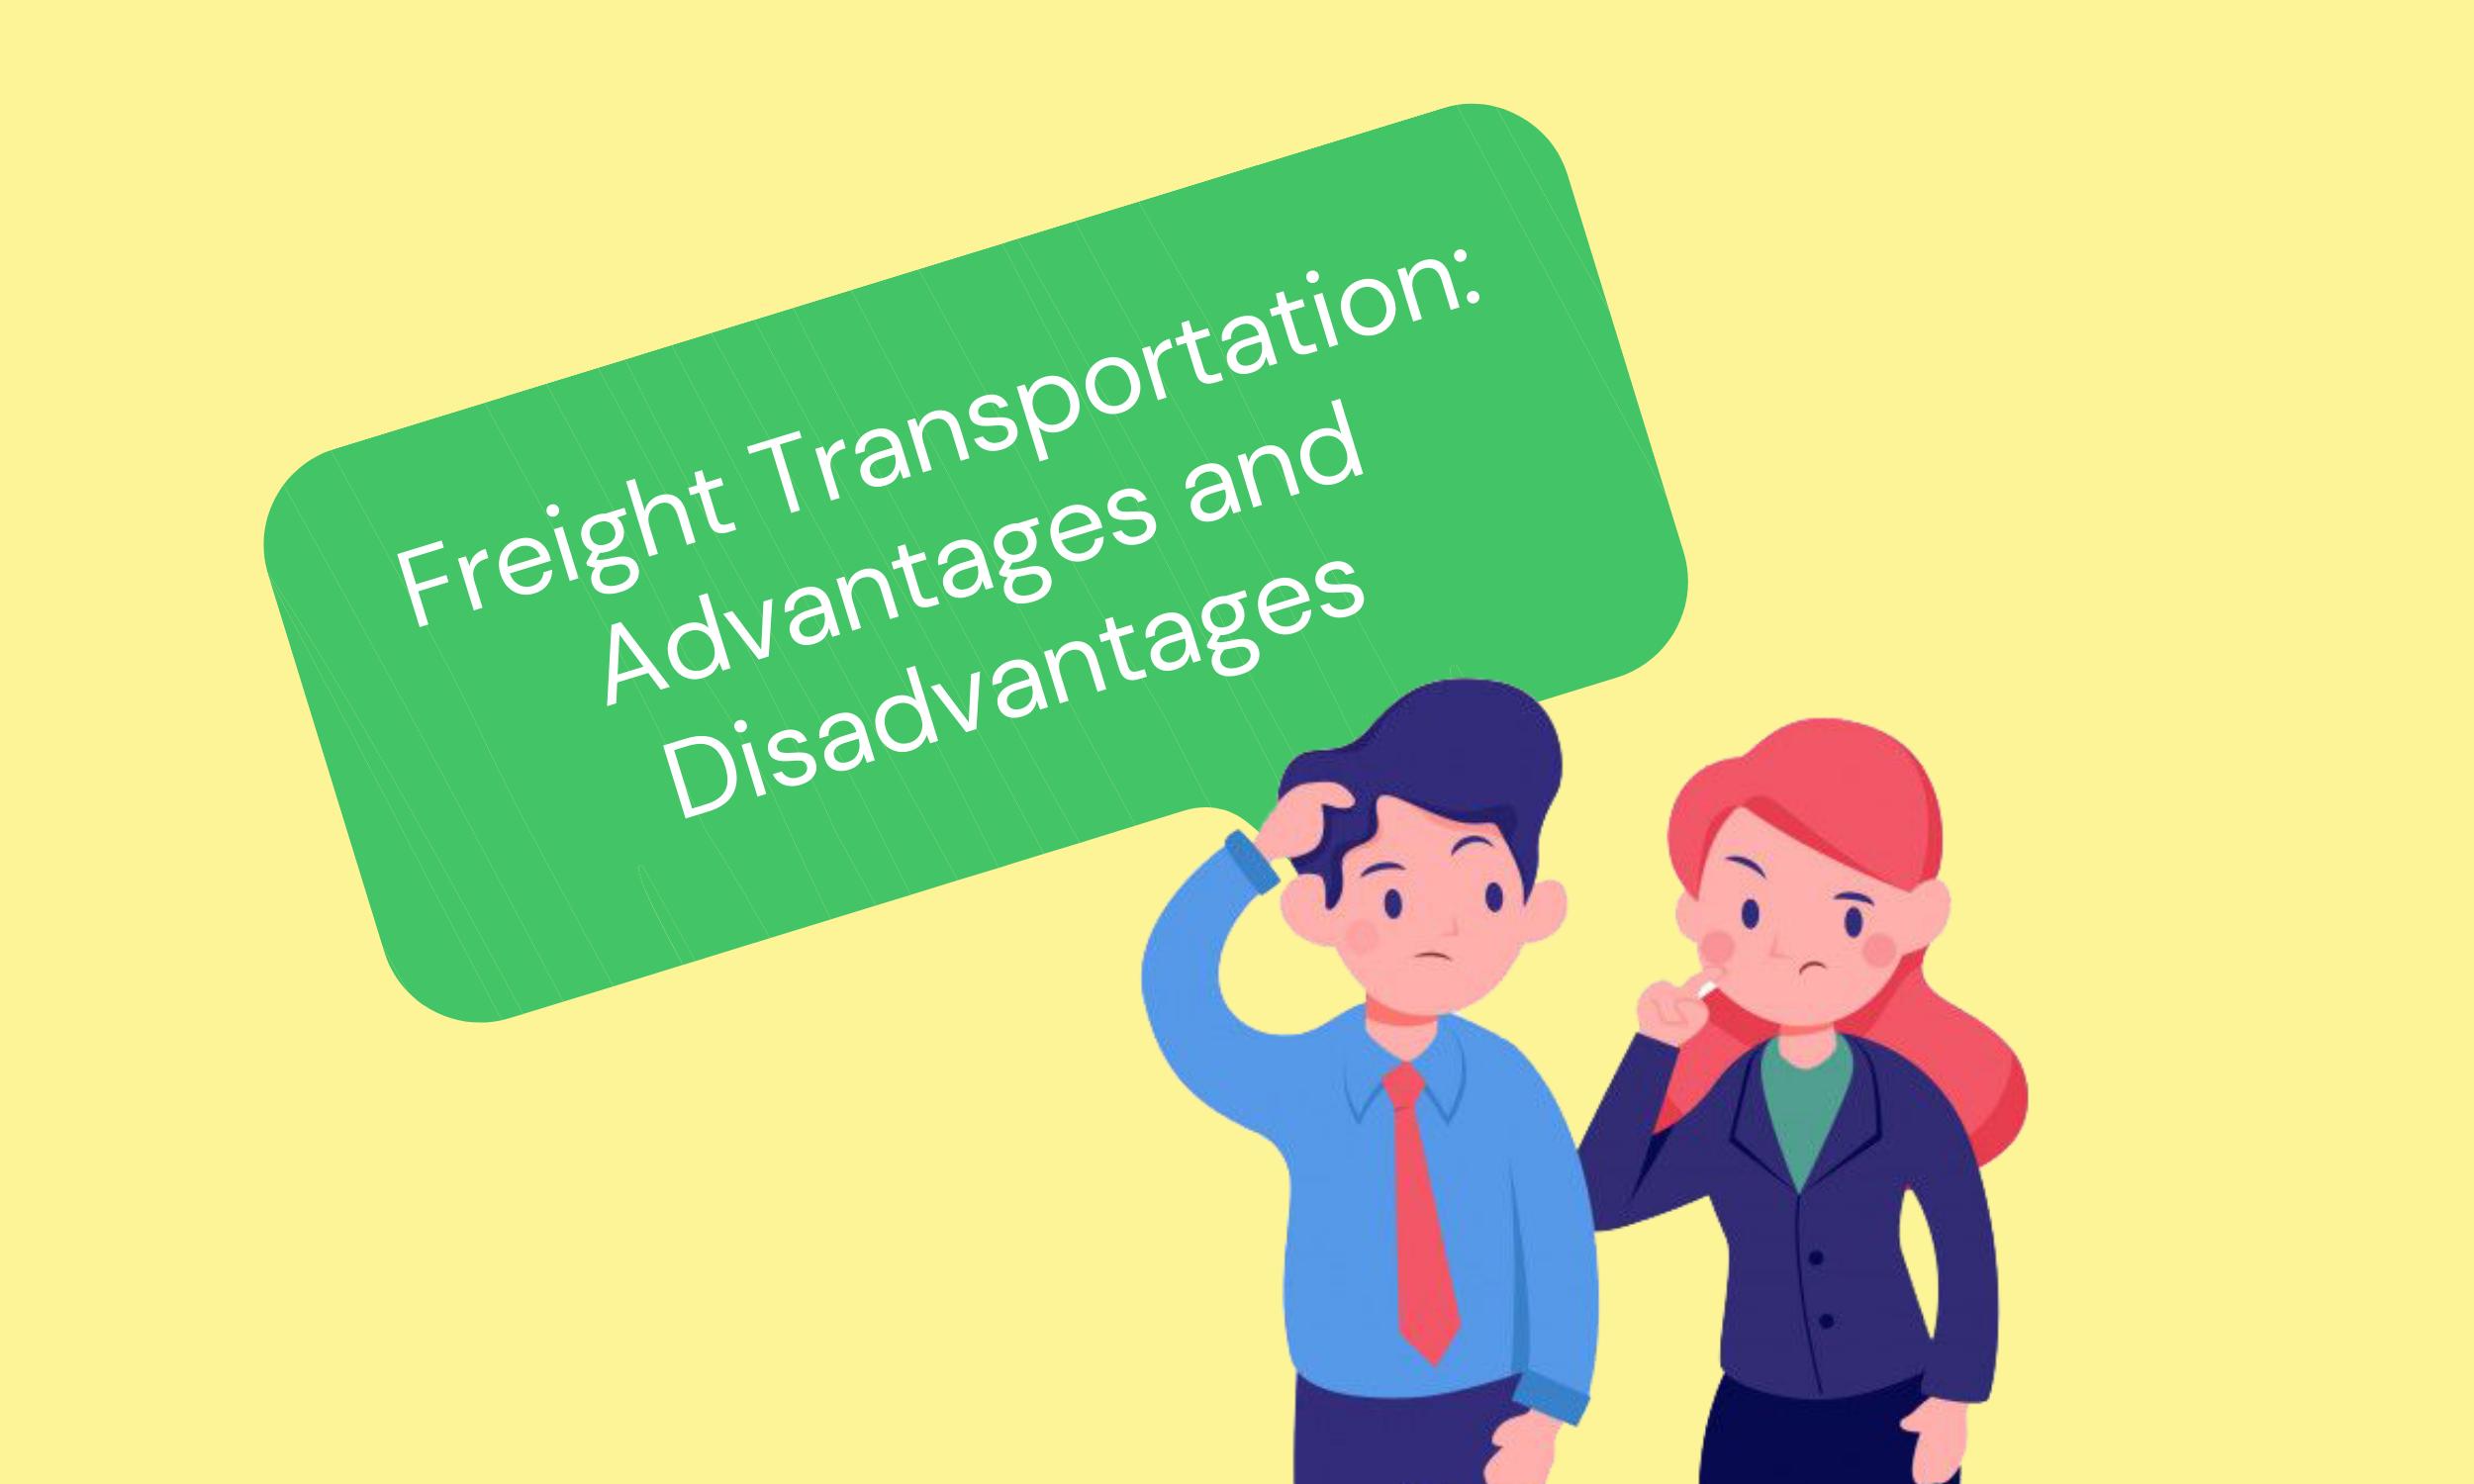 Freight-Transportation-Advantages-and-Disadvantages